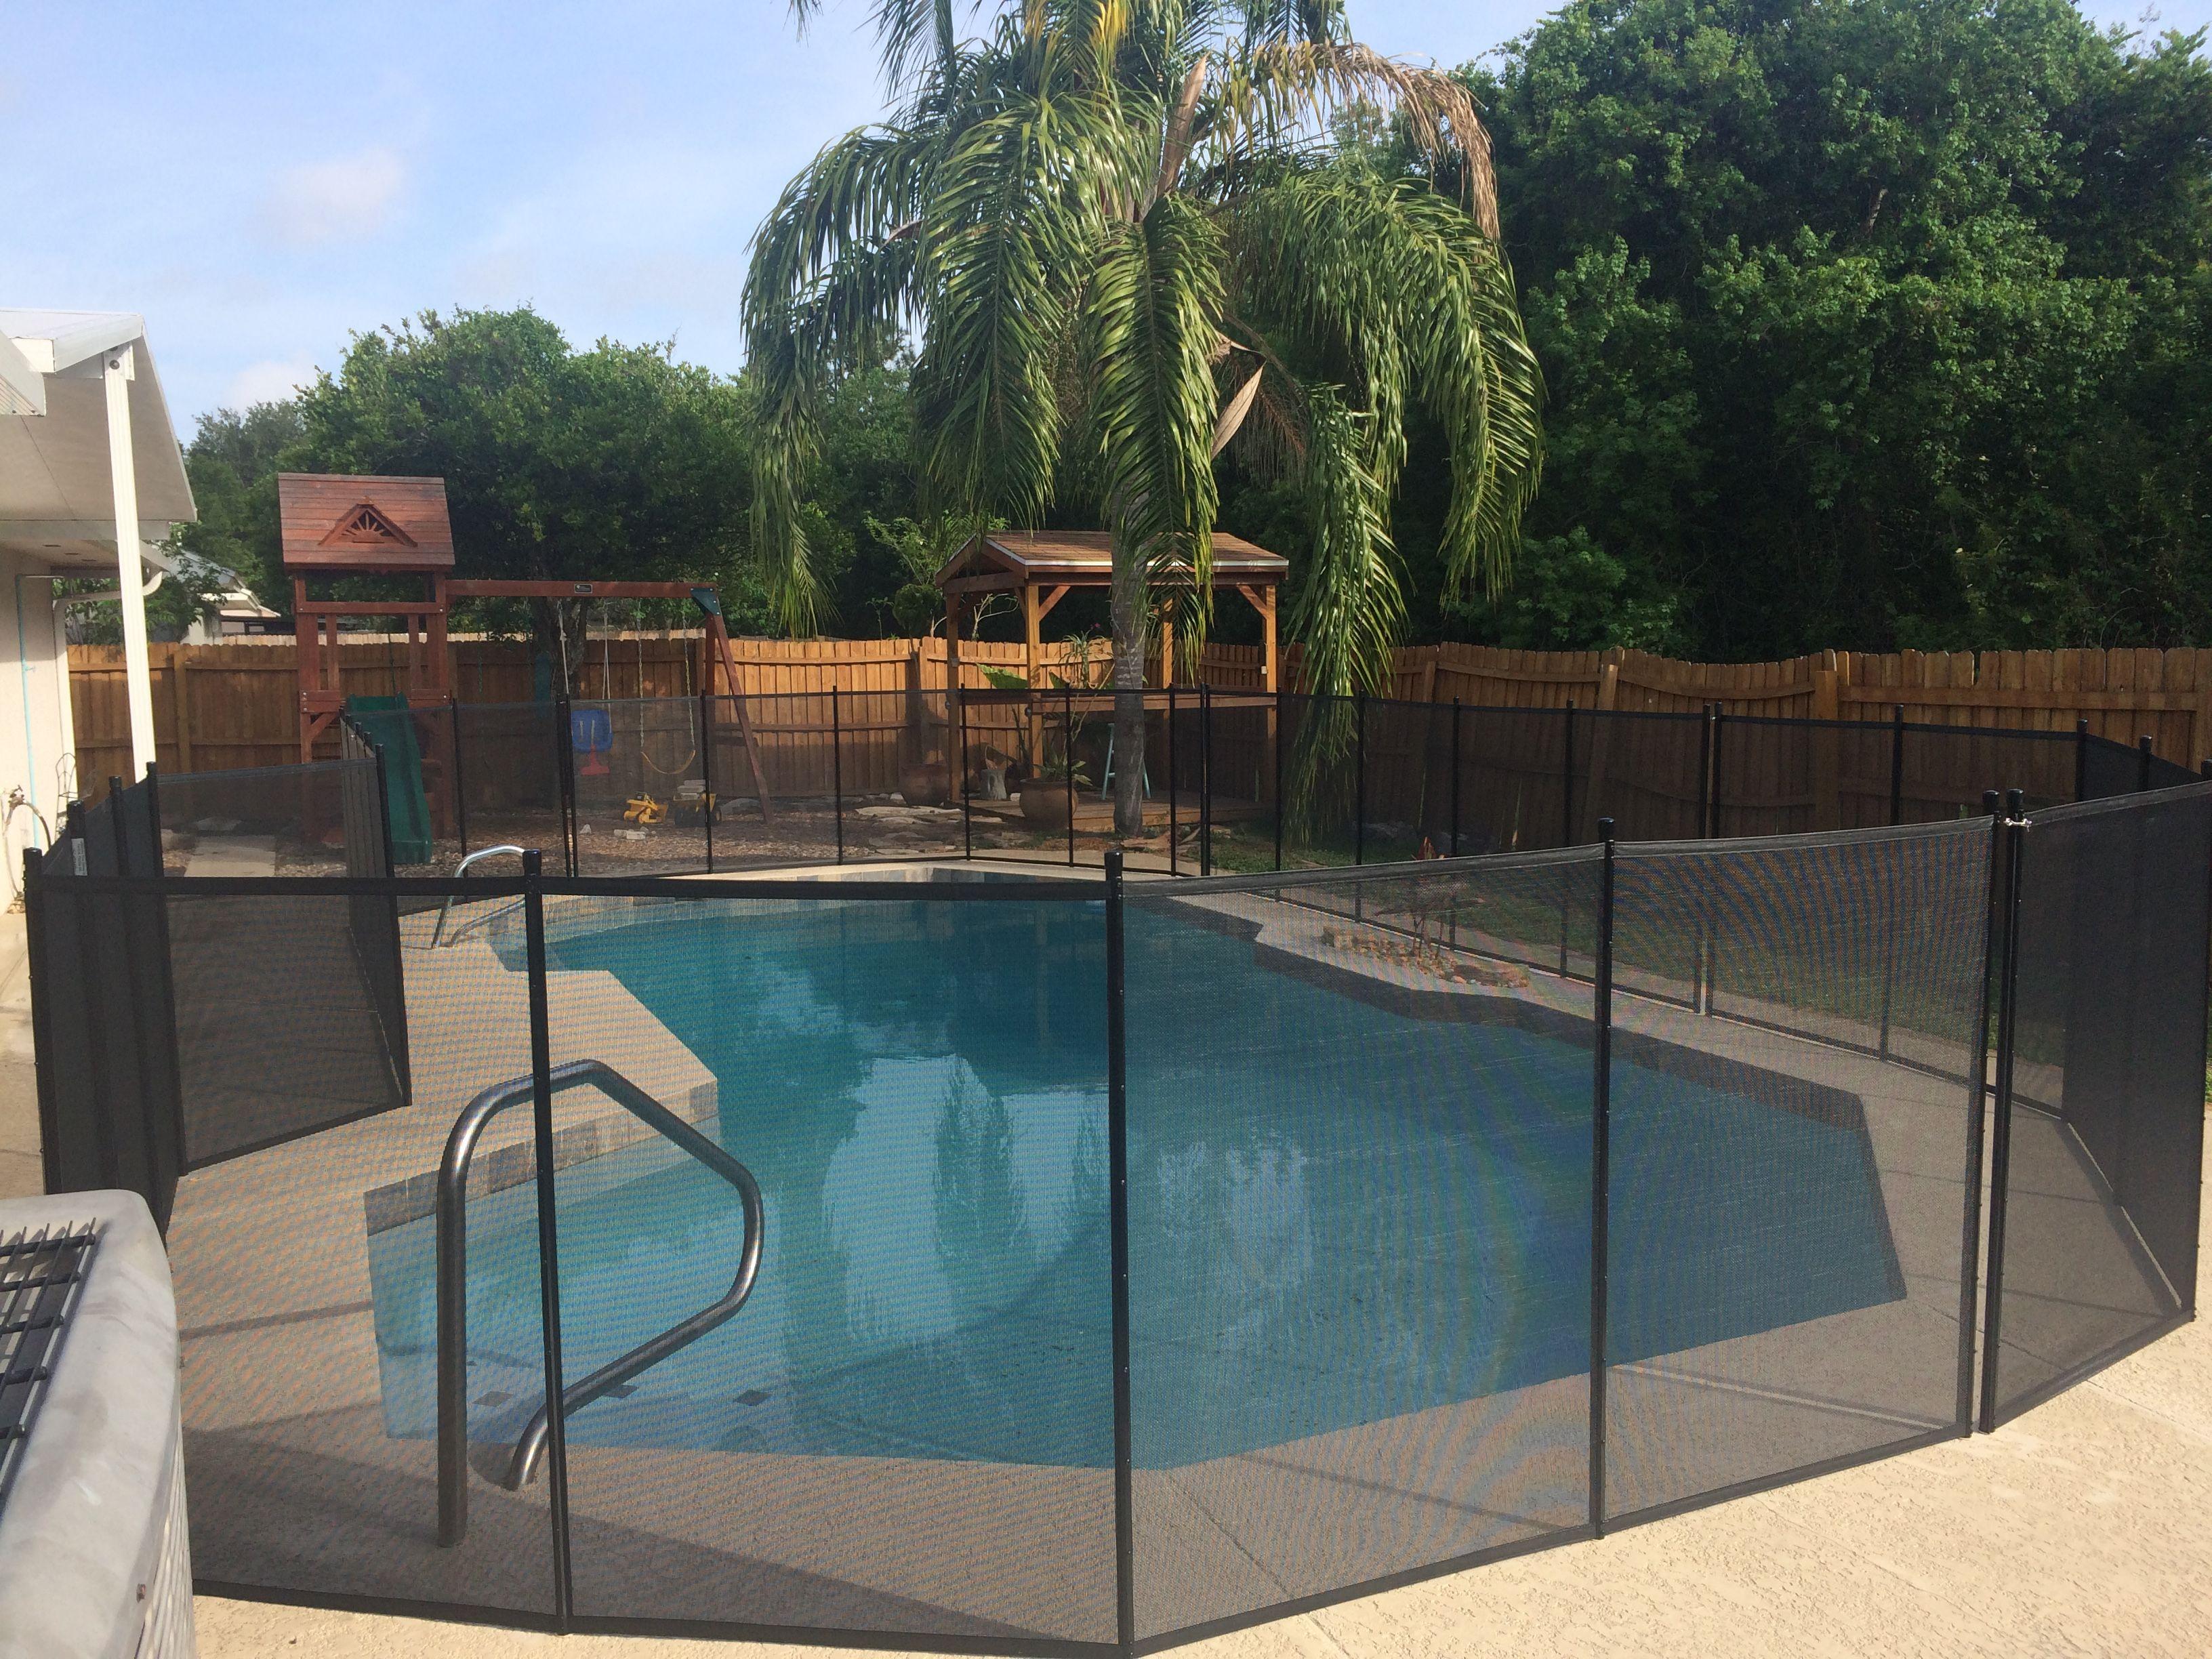 Child safety diy pool fence diy pool pool fence